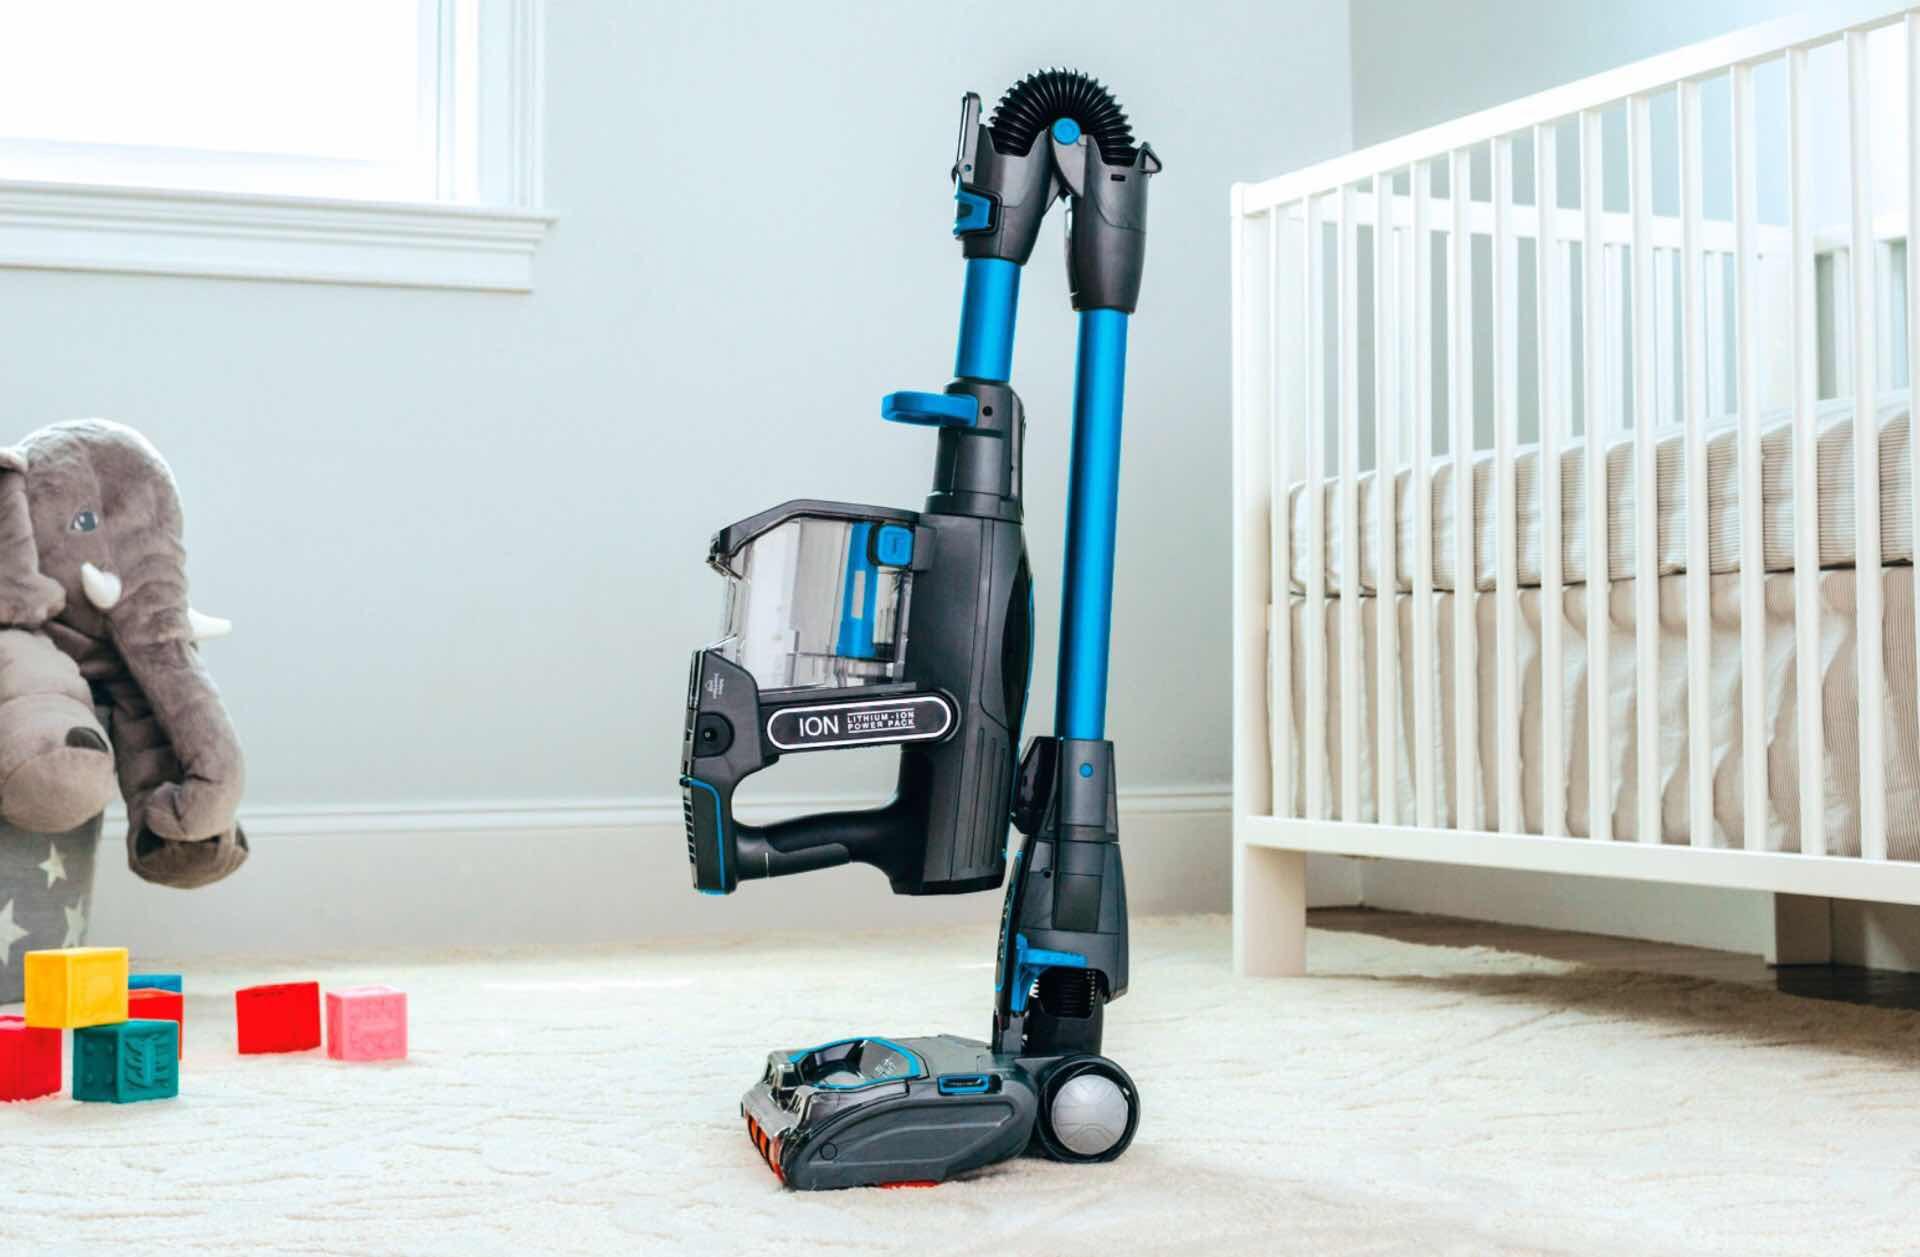 Shark Ionflex 2x Duoclean Cordless Vacuum Cleaner Tools